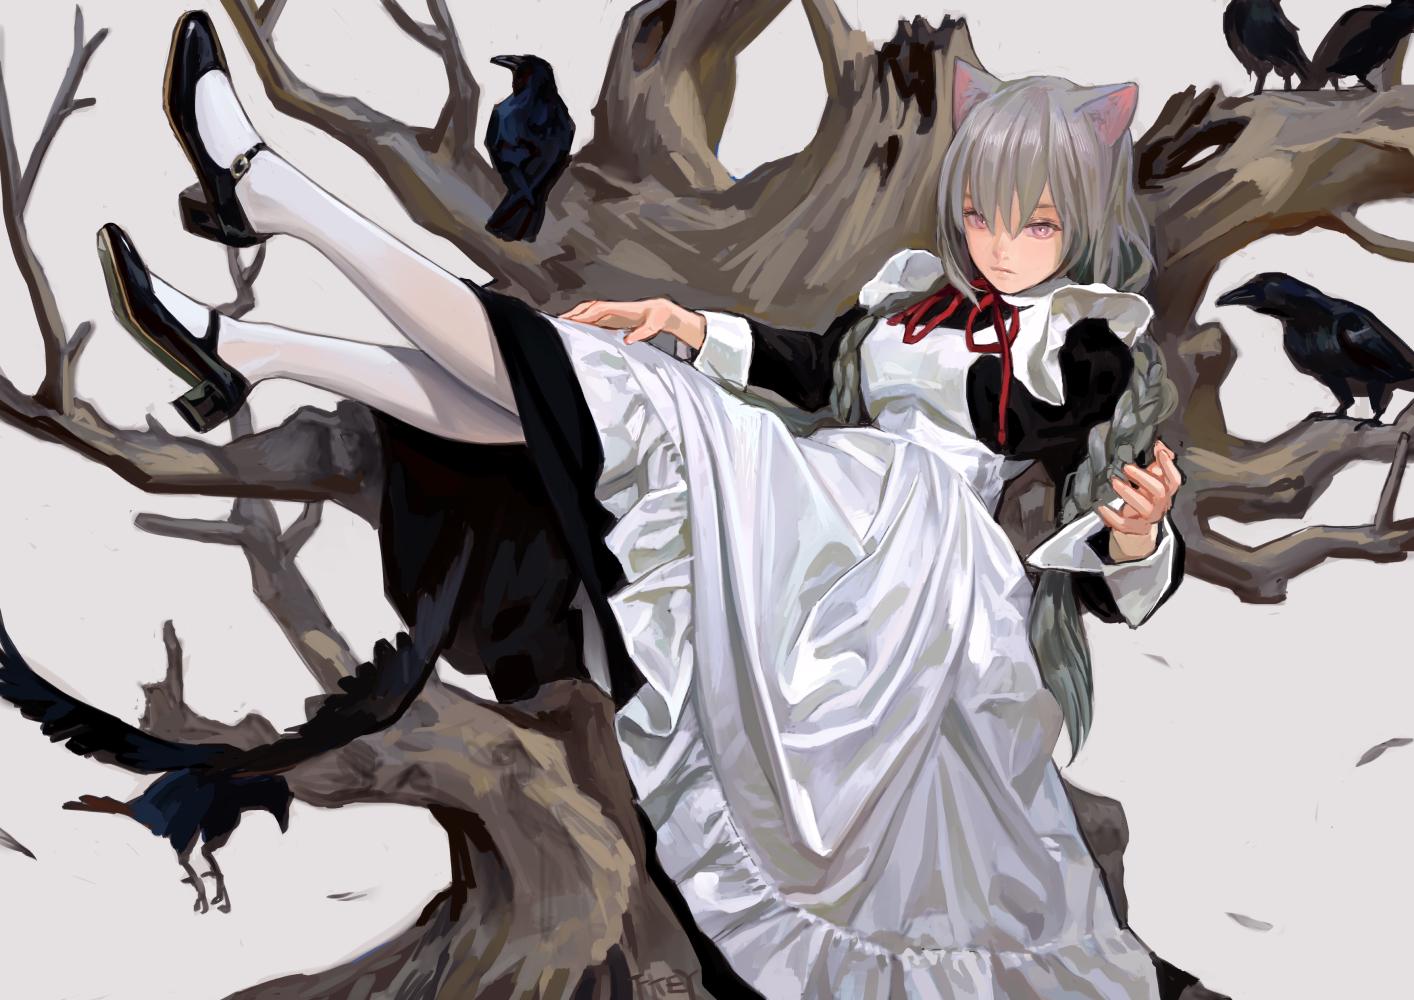 Anime Girls Original Characters Raven Maid Outfit Cat Girl Nekomimi Monster Girl Braided Hair Black  1414x1000